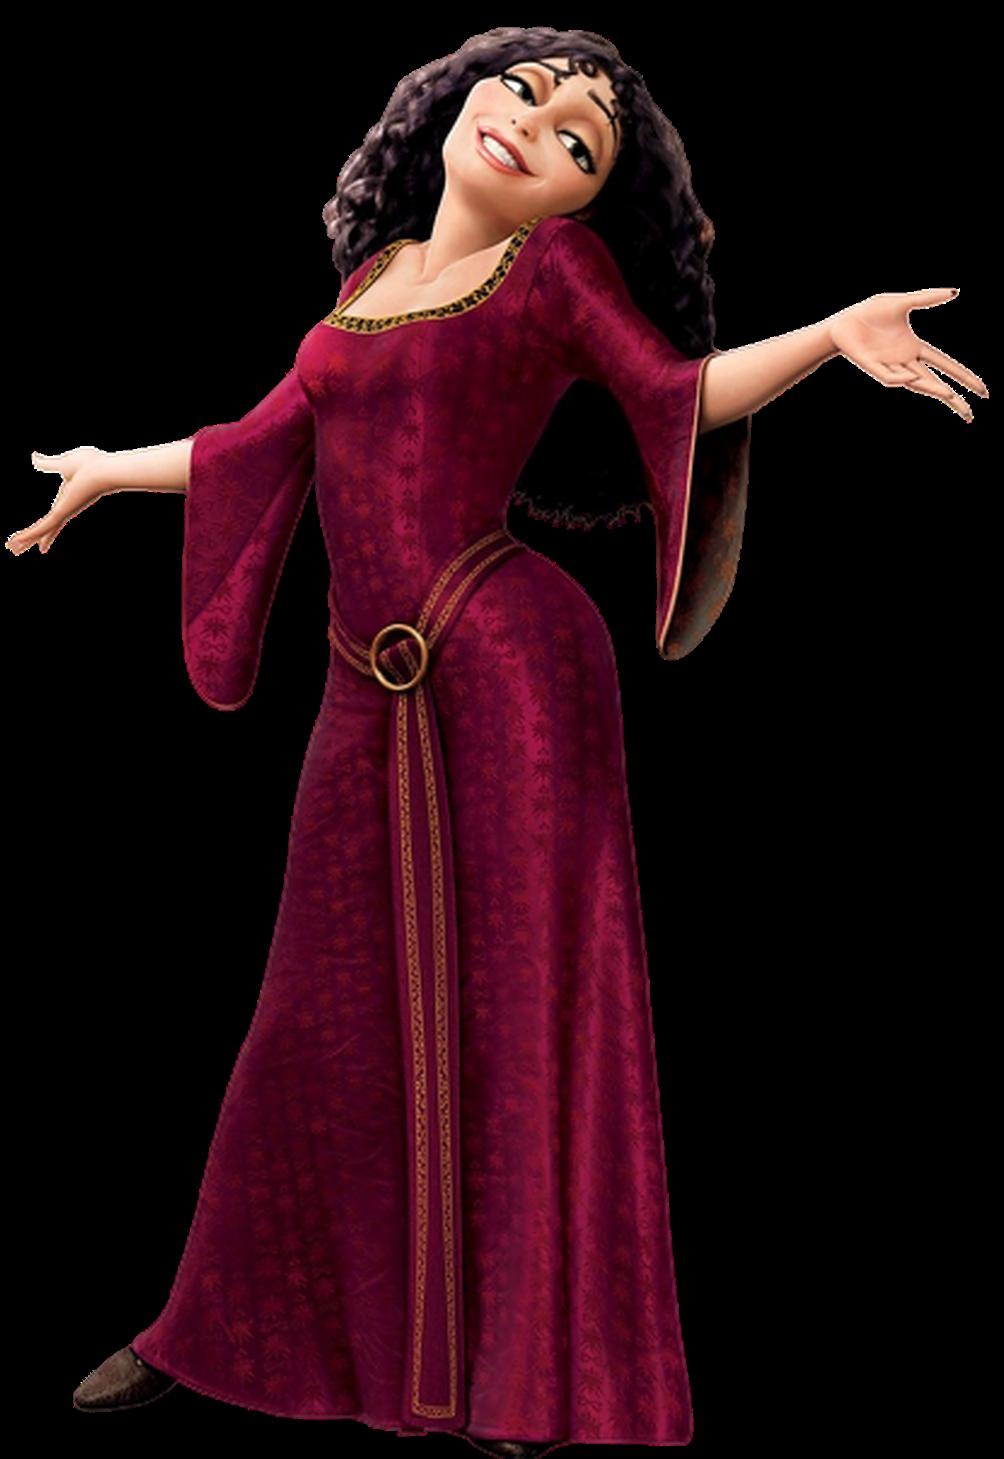 Mother Gothel Villains Wiki Fandom Powered By Wikia